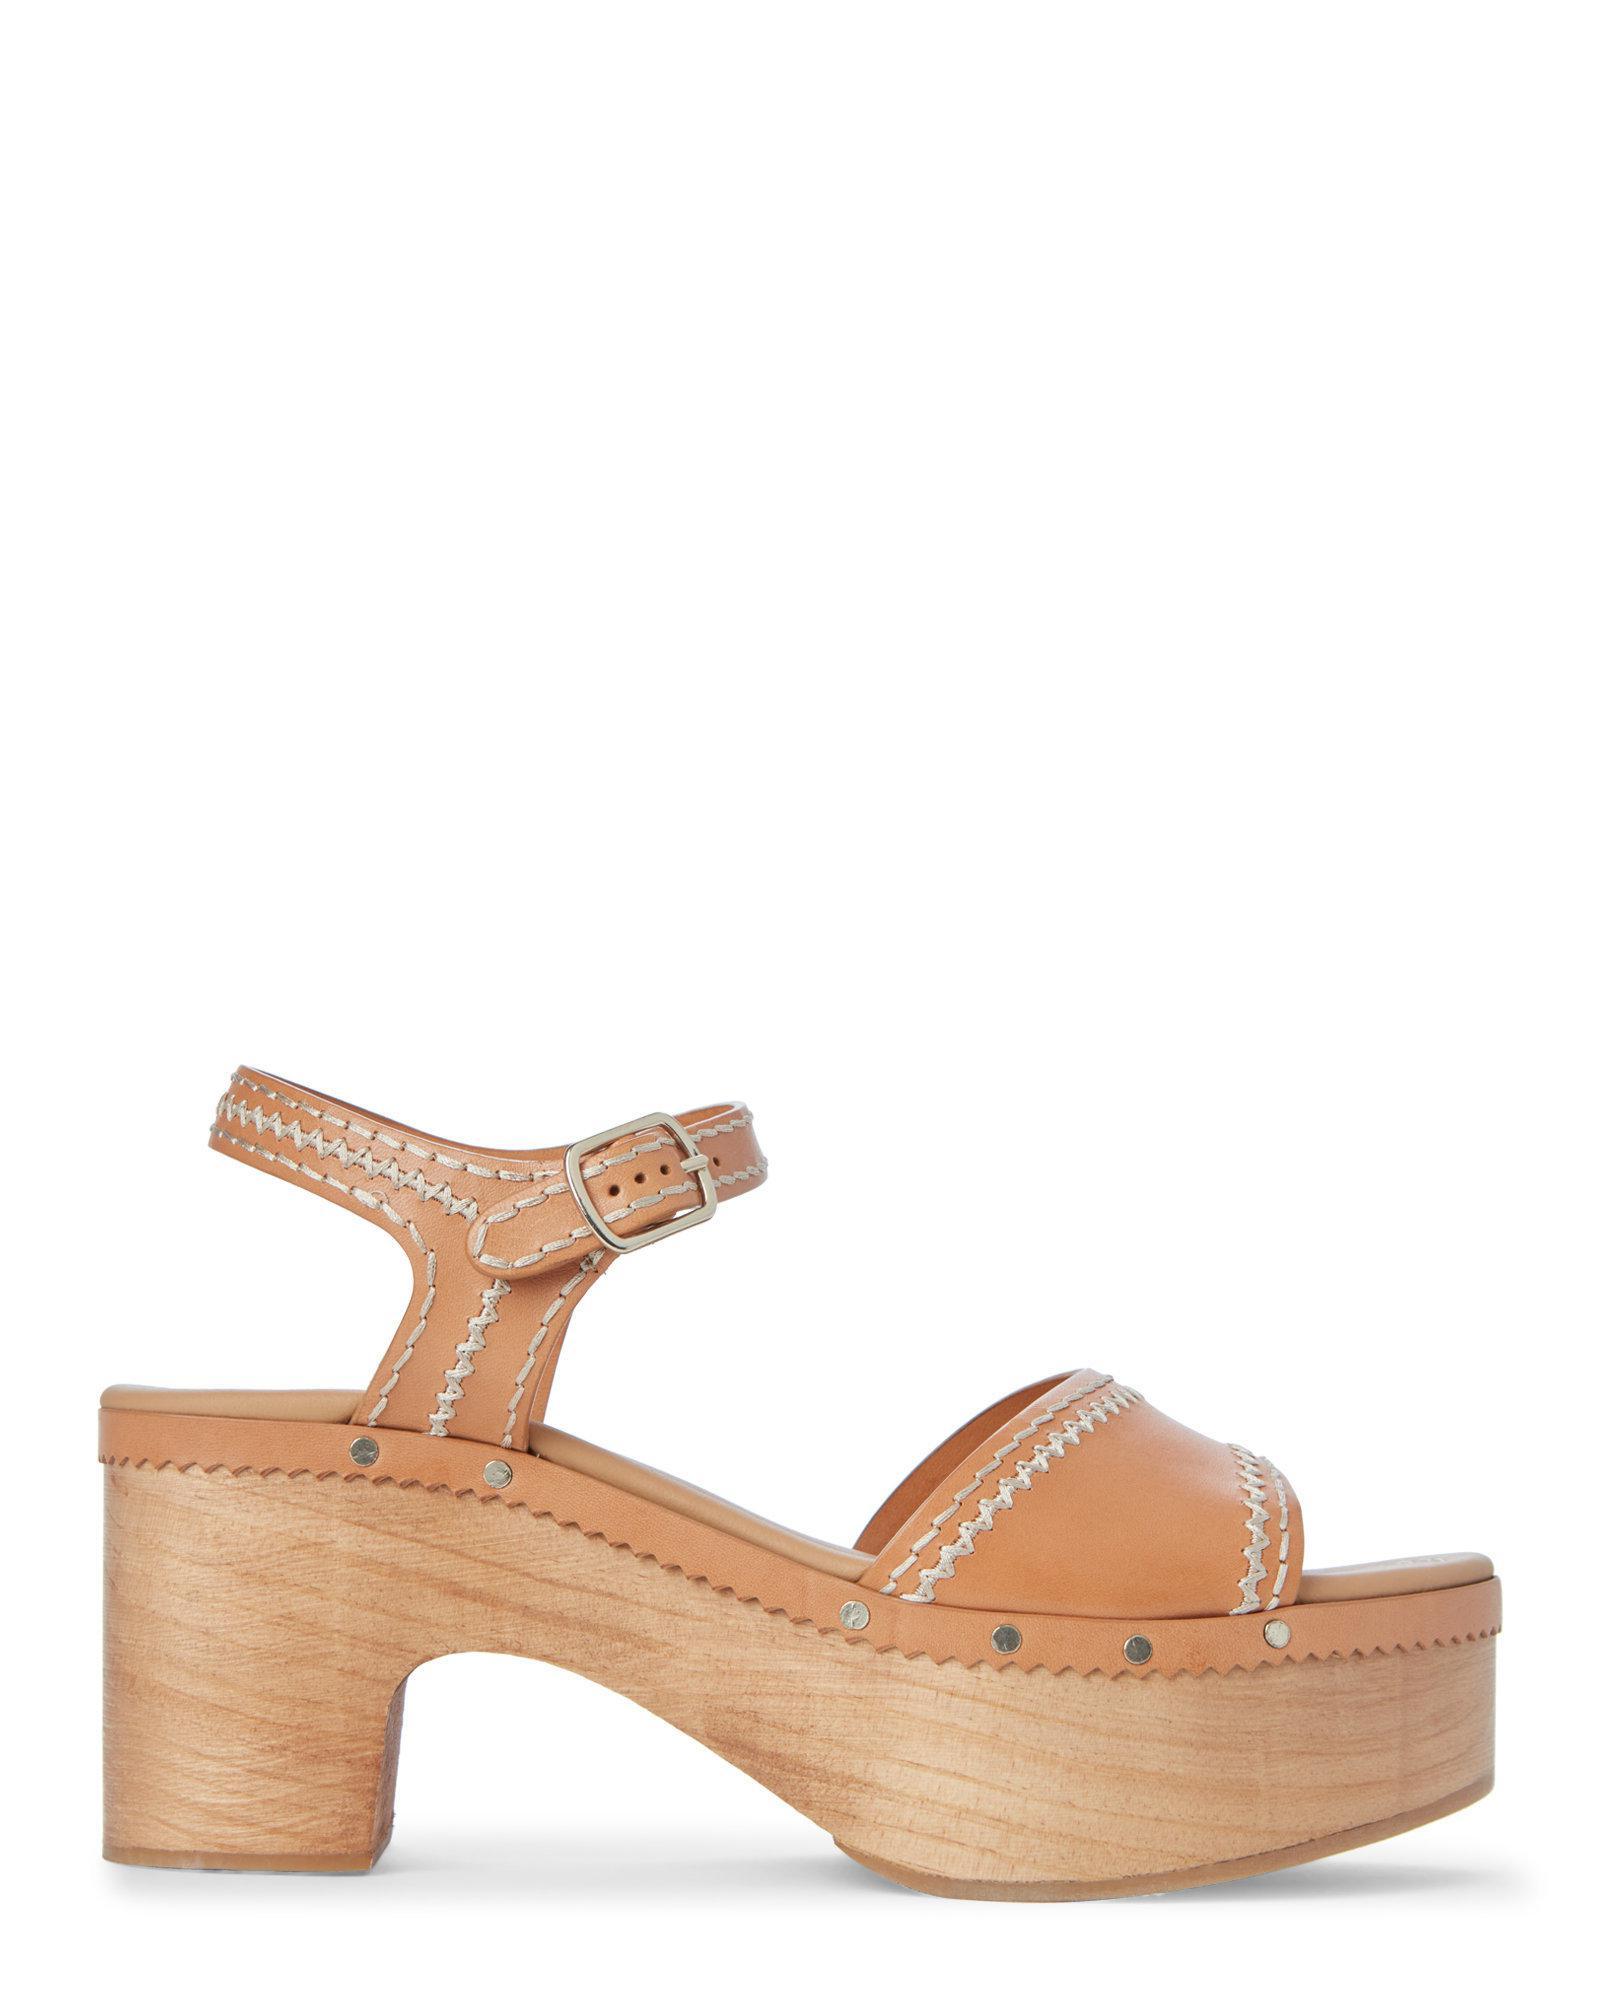 b58cf1d0cb037 Lyst - Sandro Camel Audry Wooden Platform Sandals in Natural